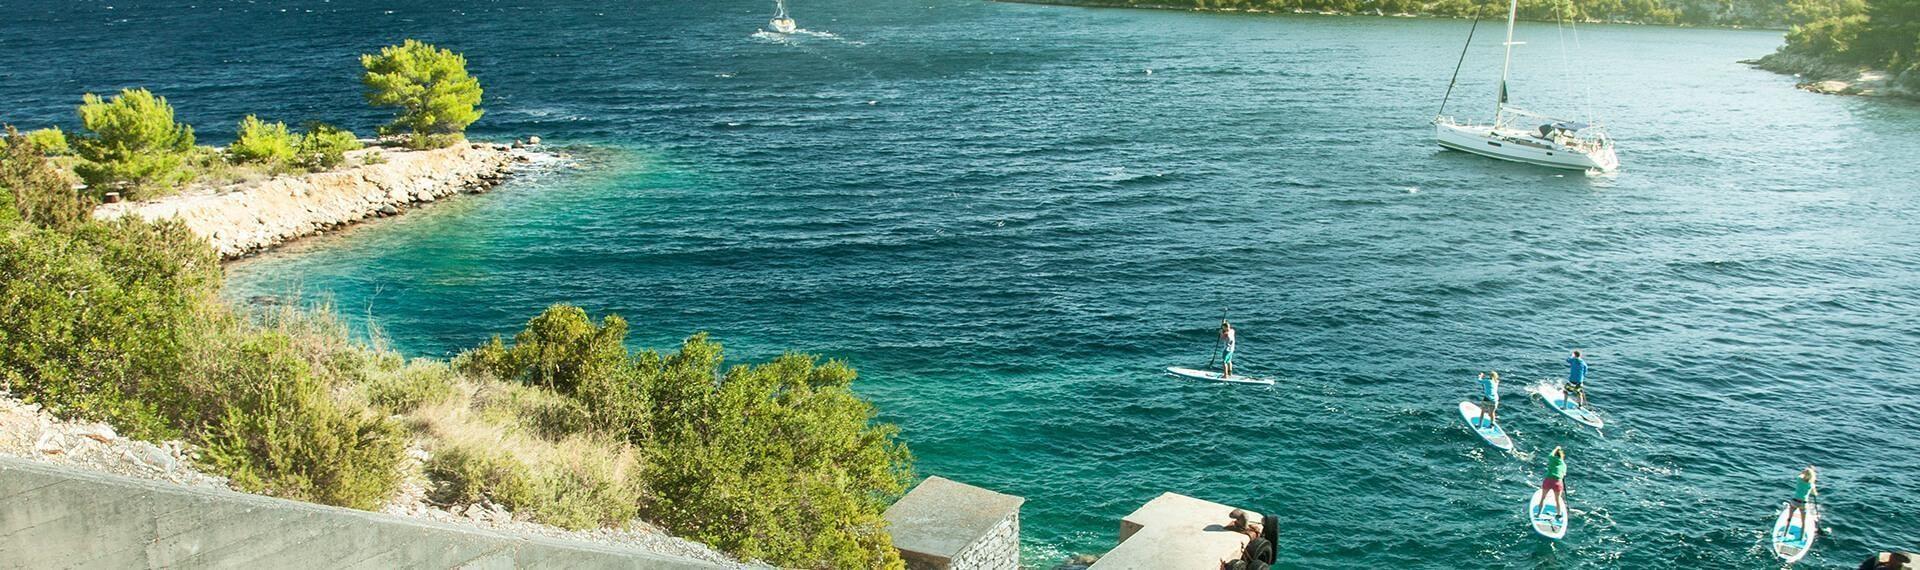 sup-sail-cover